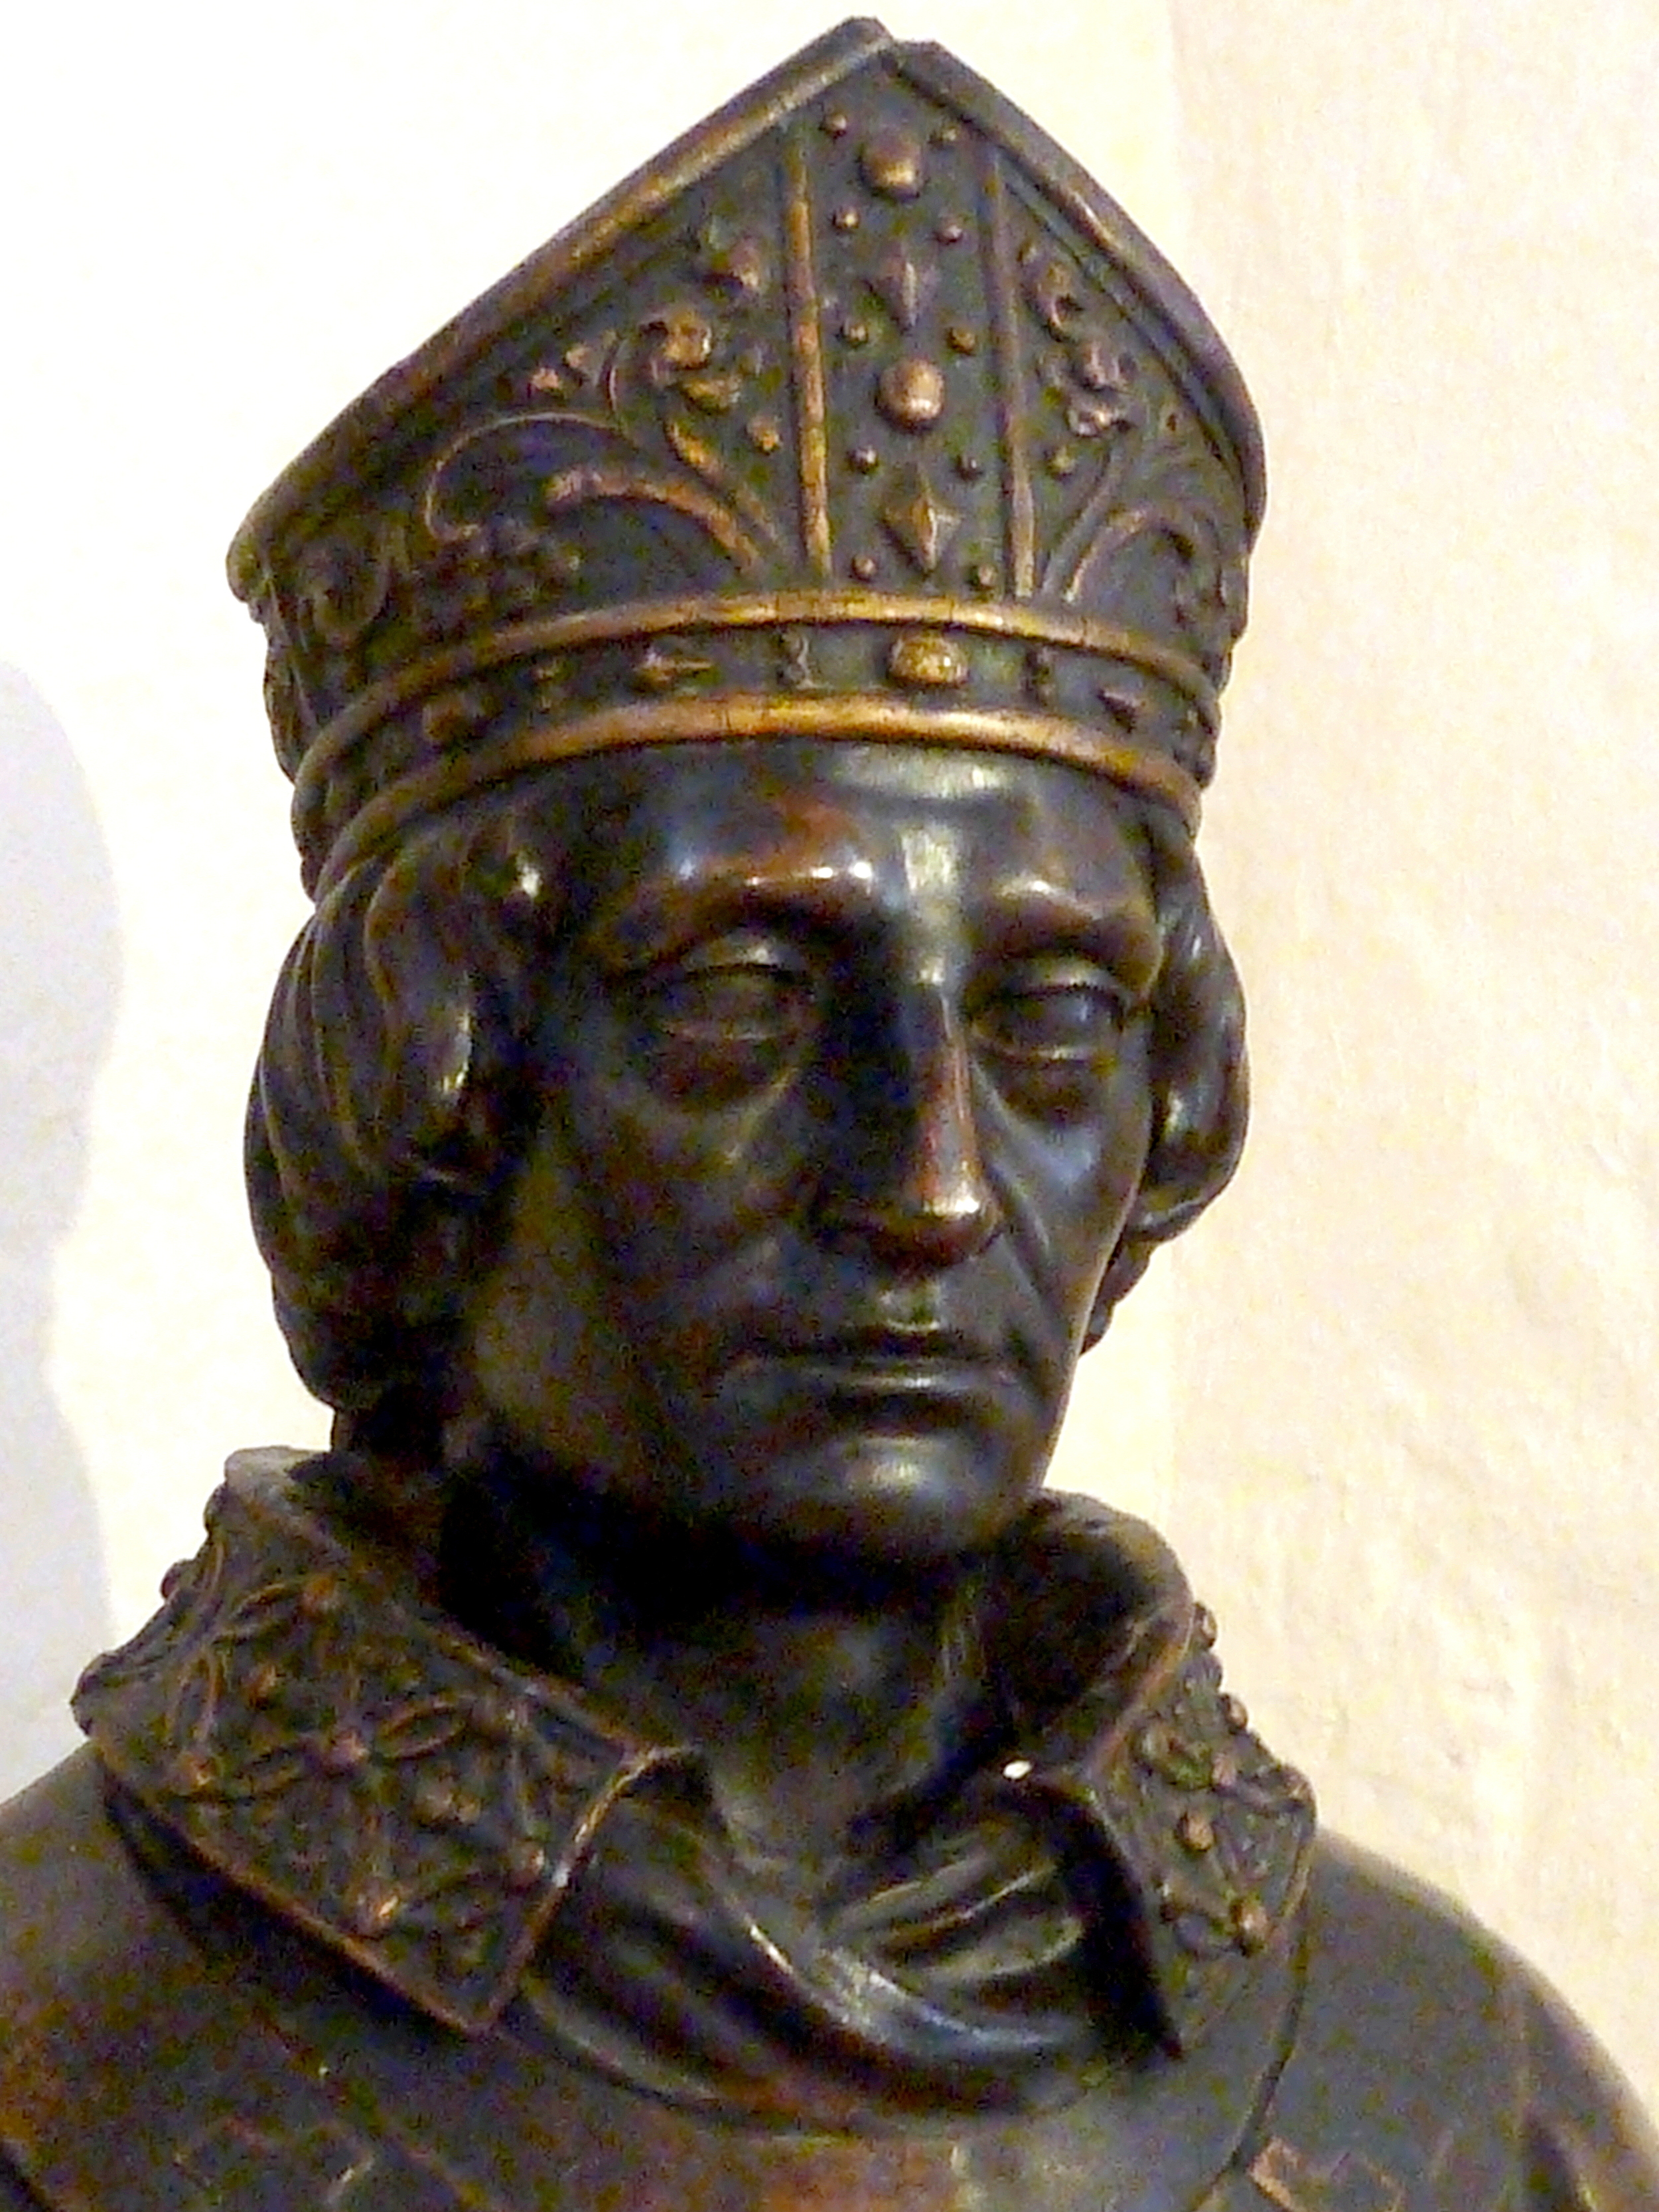 Stephen Langton (c. 1155 - 1228) Archbishop of Canterbury